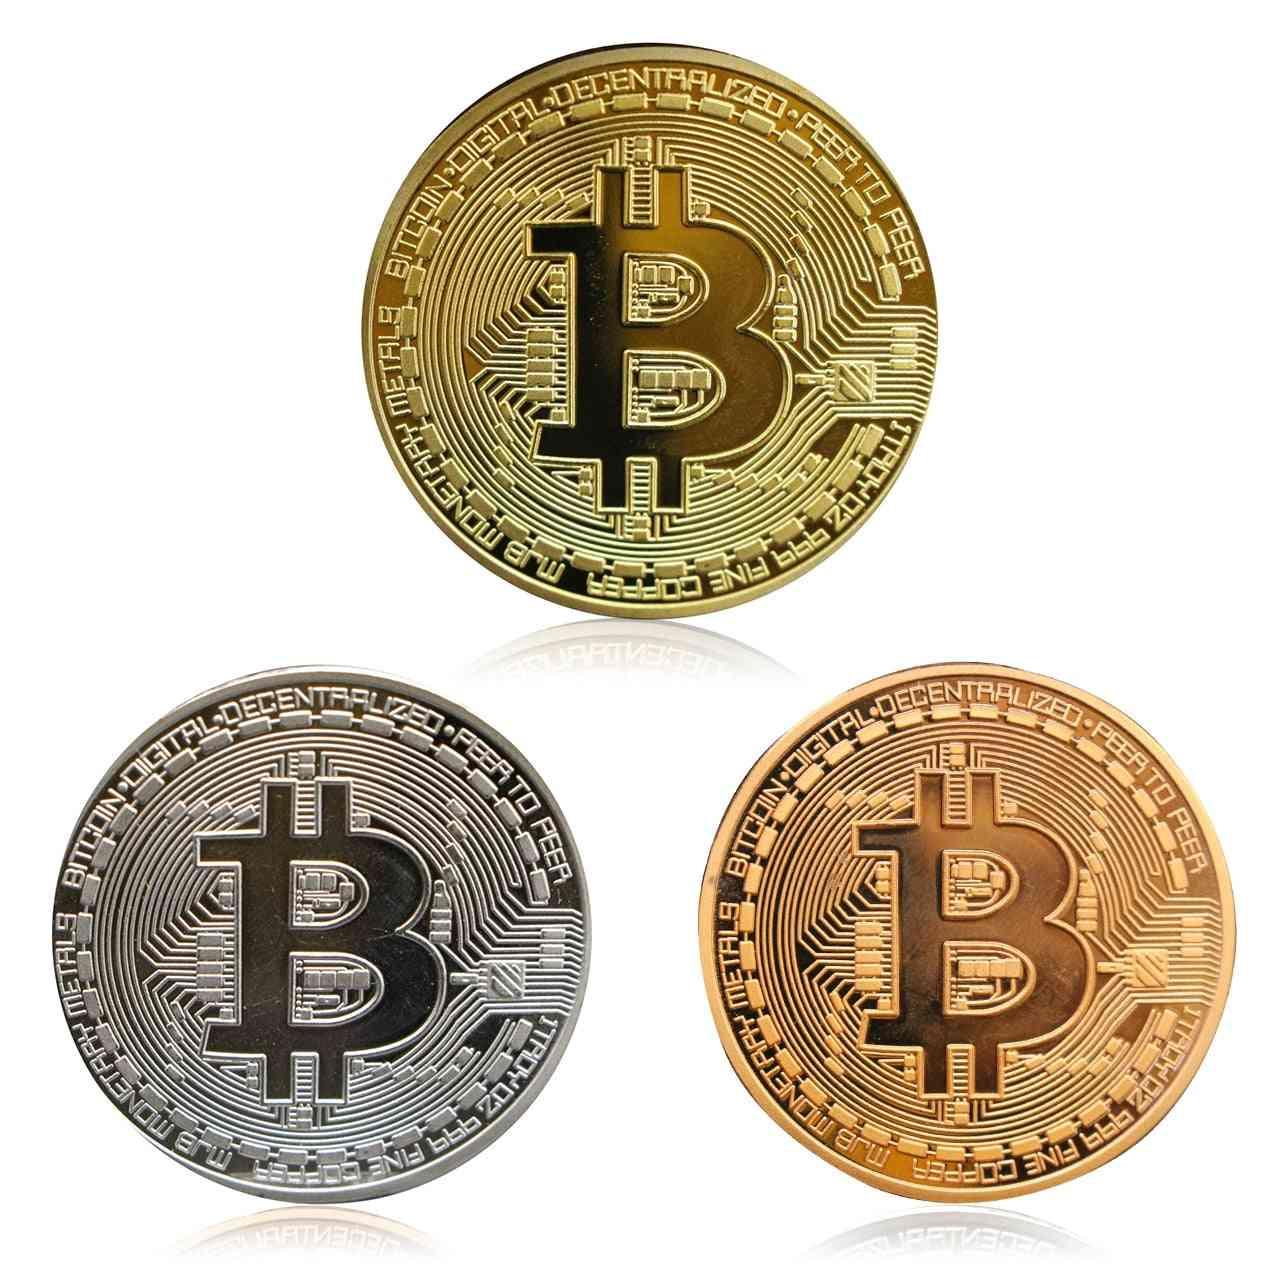 Gold Plated Bitcoins Imitation Coin-souvenir Medal